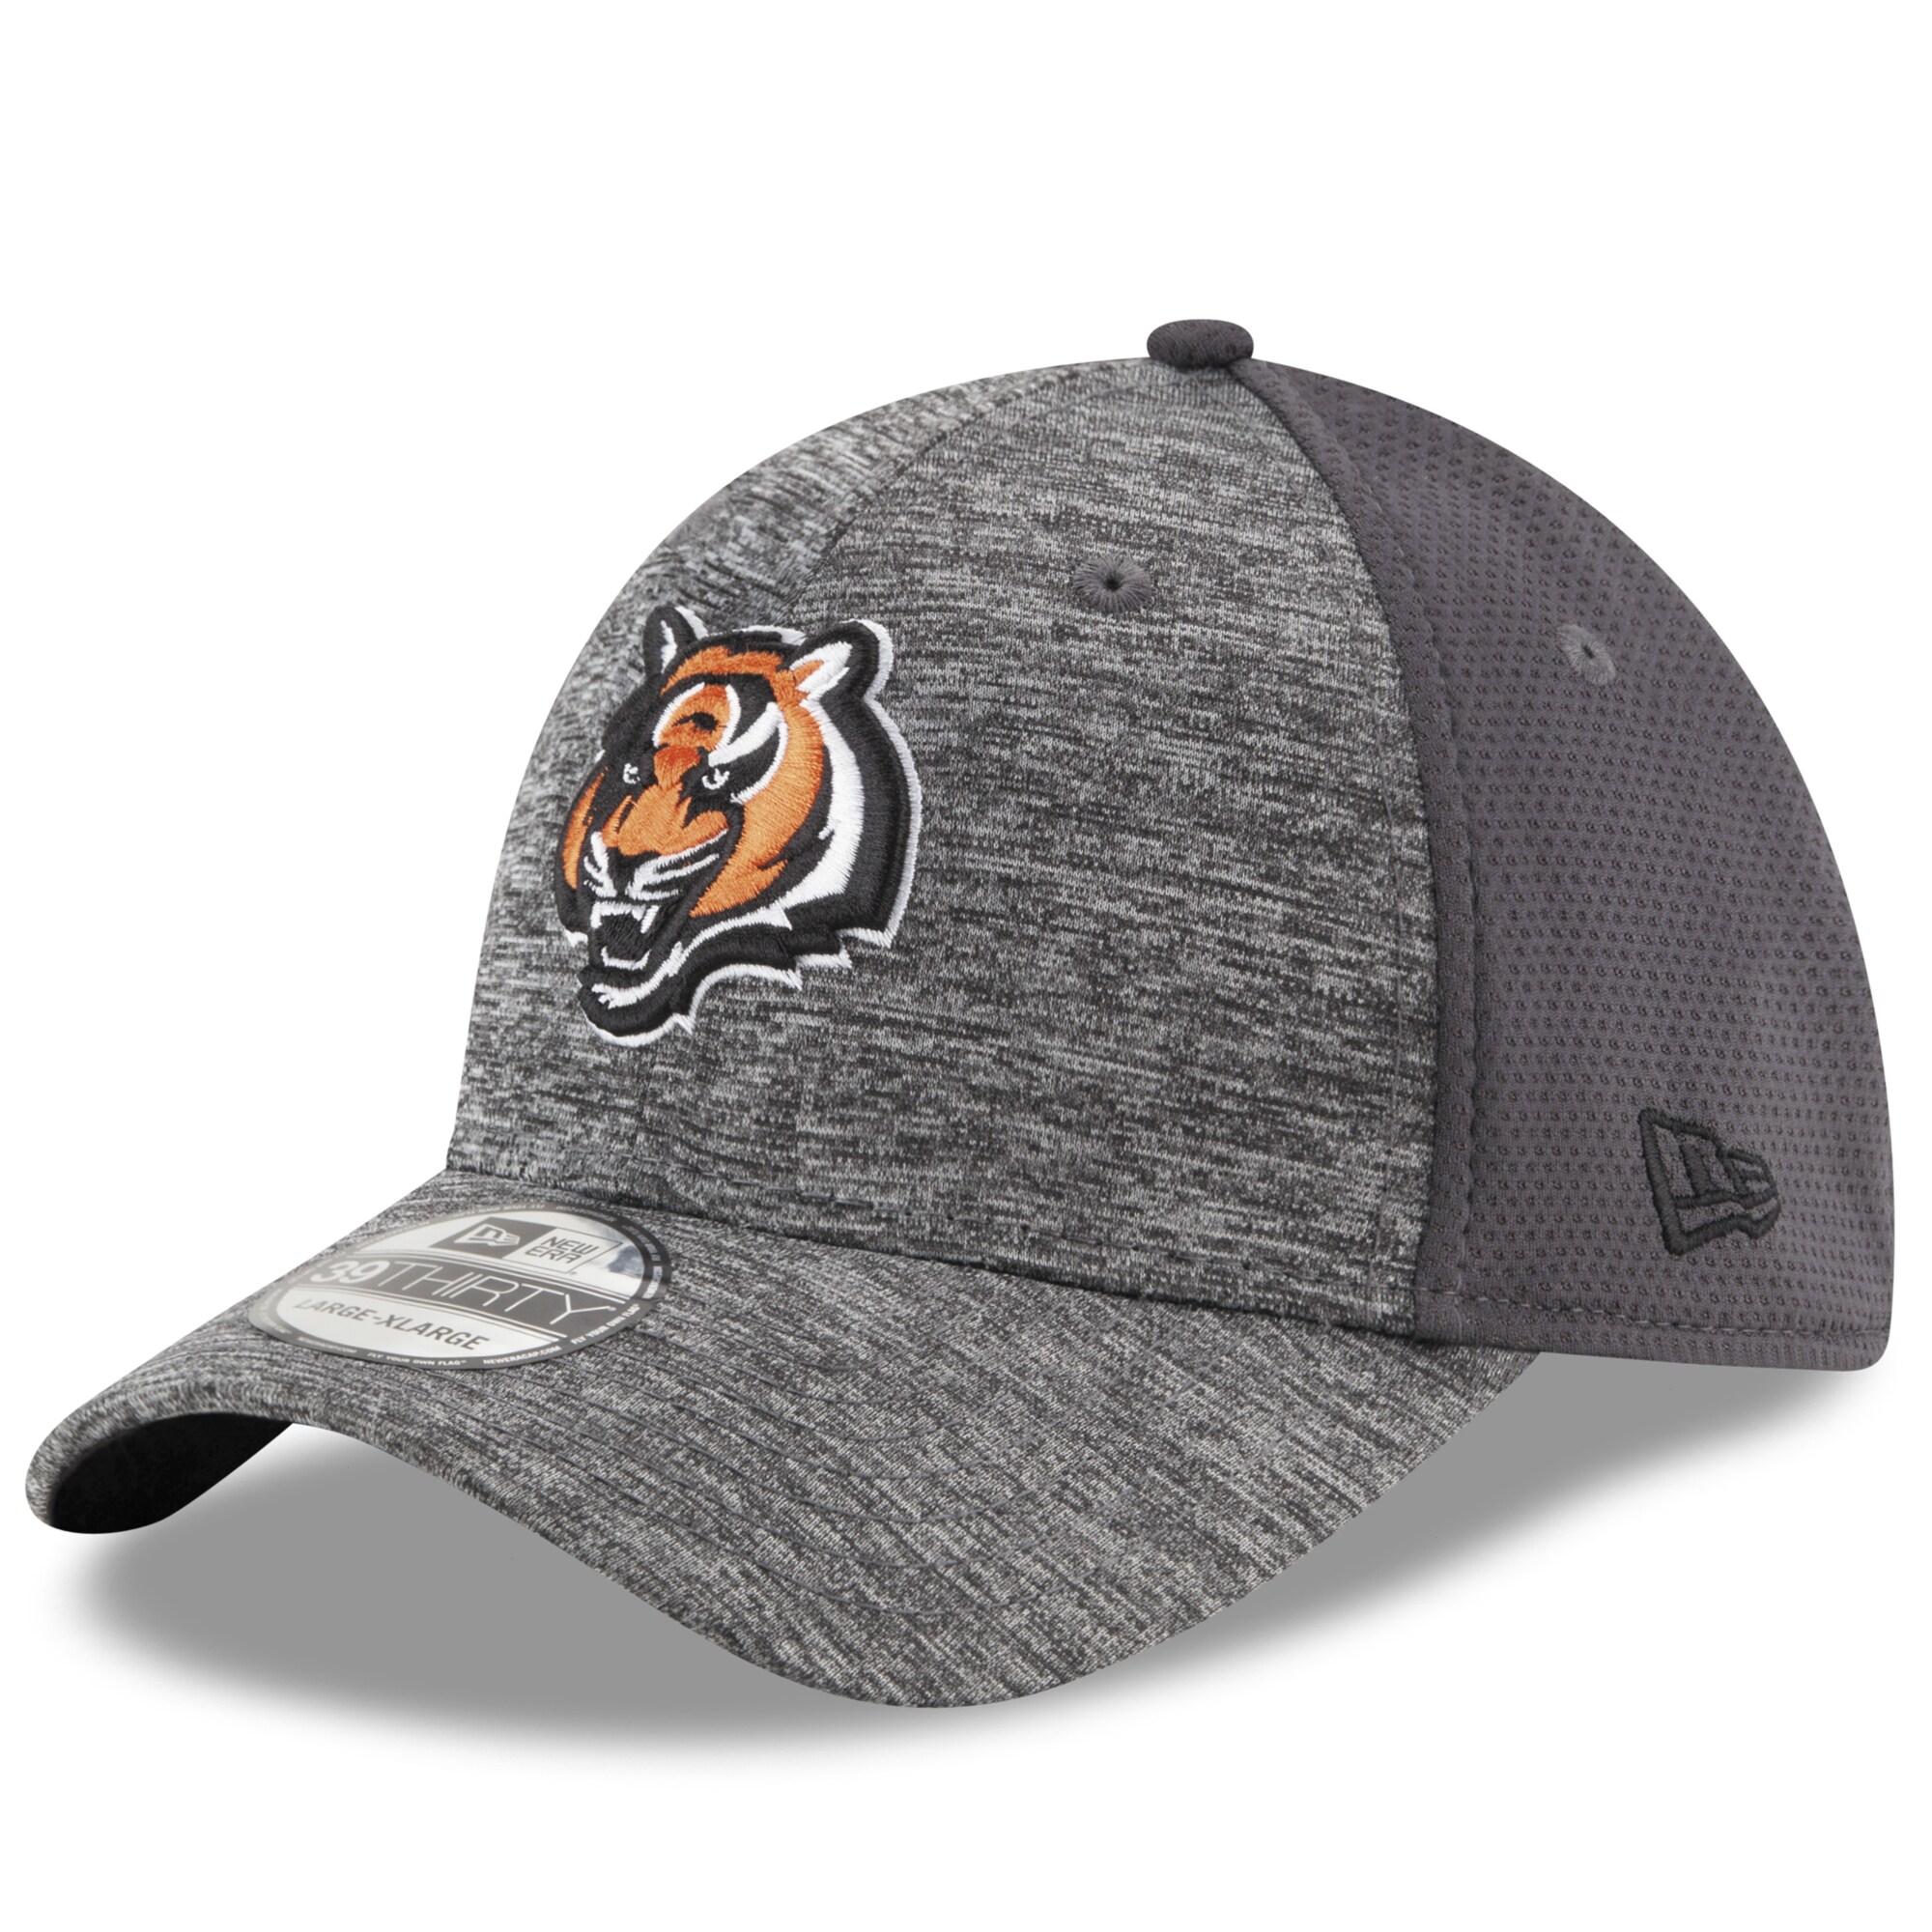 Cincinnati Bengals New Era Shadowed Team 39THIRTY Flex Hat - Heathered Gray/Graphite